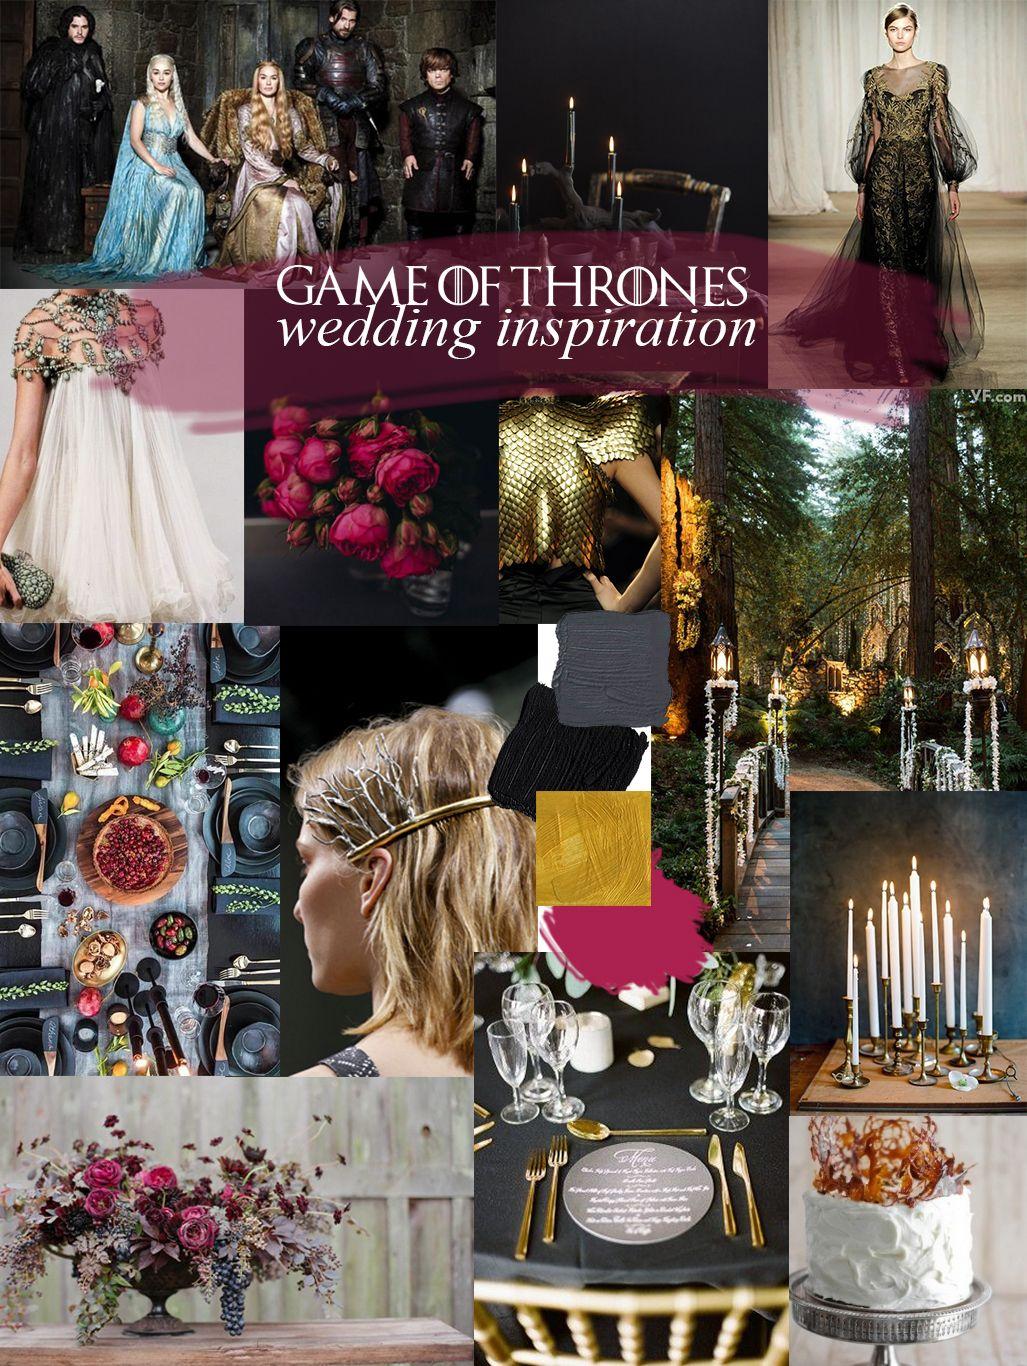 wedding inspiration: game of thrones! | wedding themes